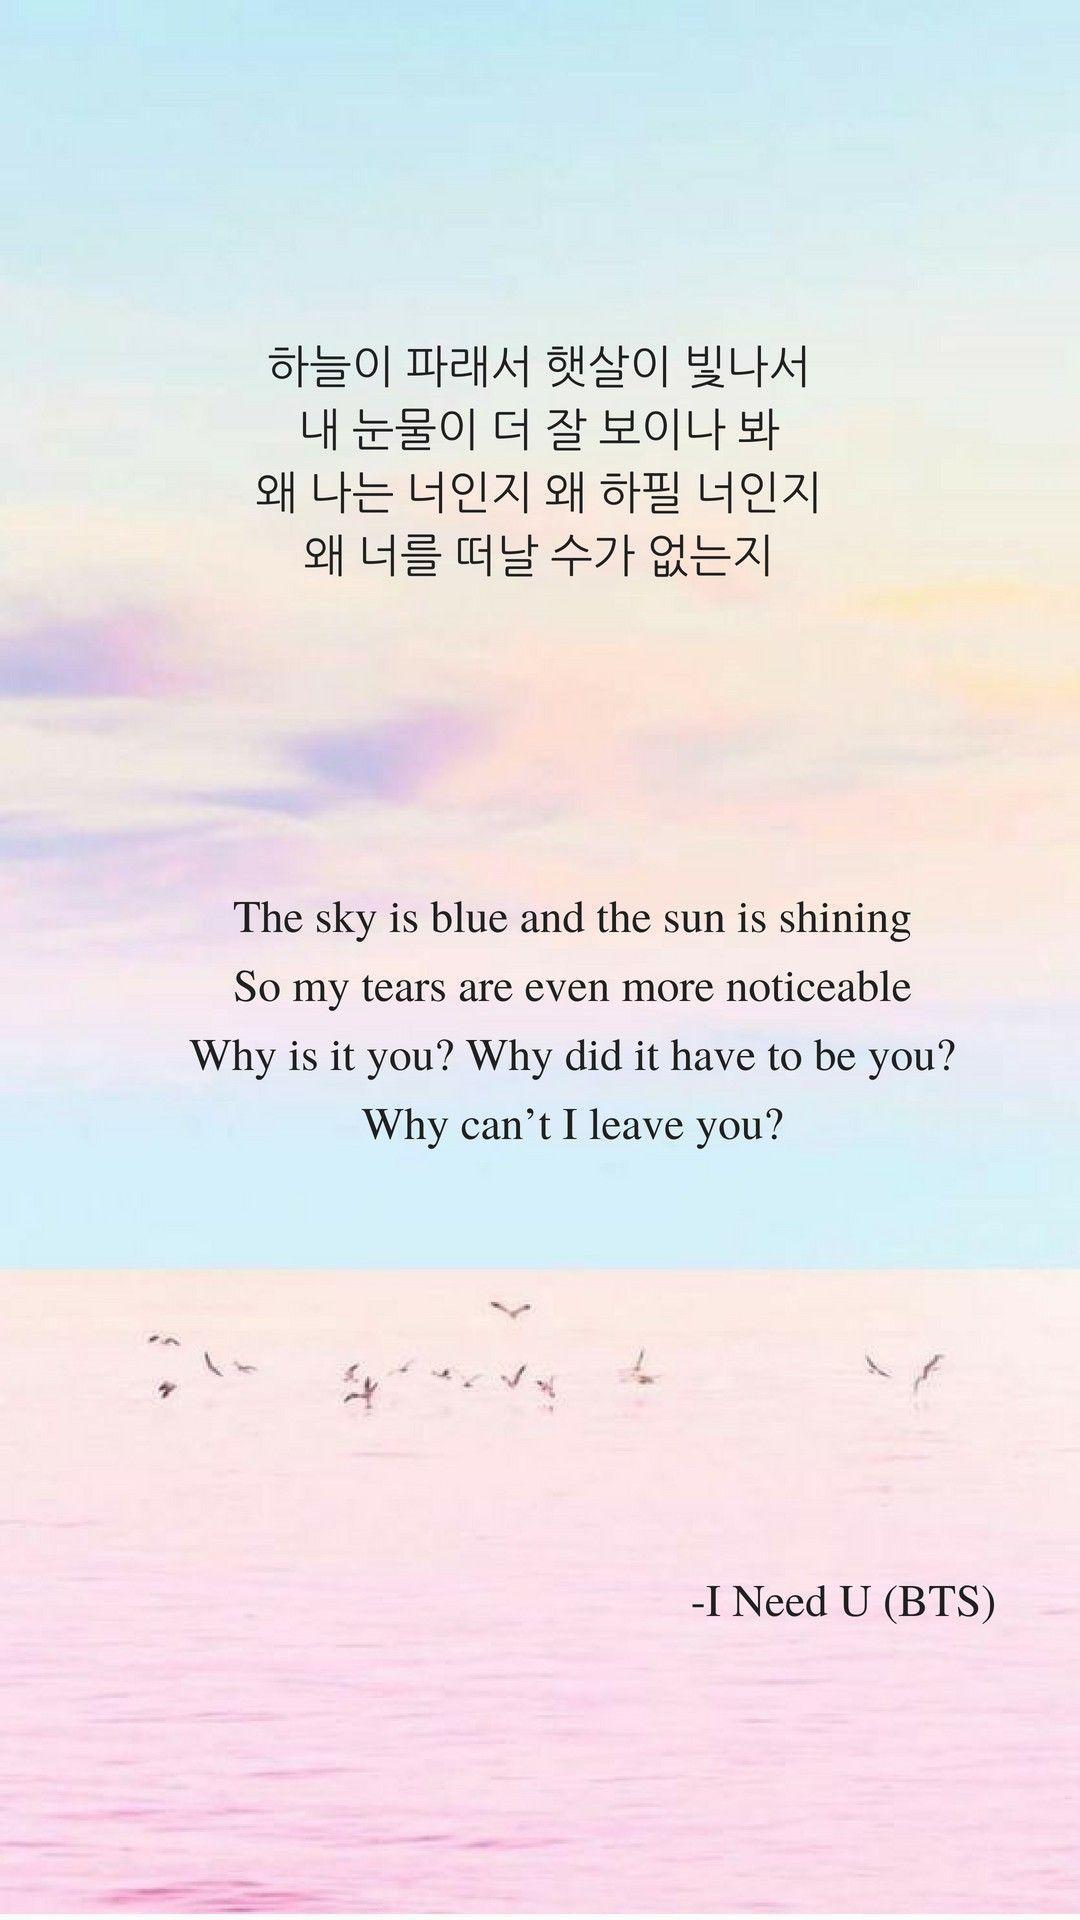 Park Art|My WordPress Blog_I Need A Woman To Love Lyrics